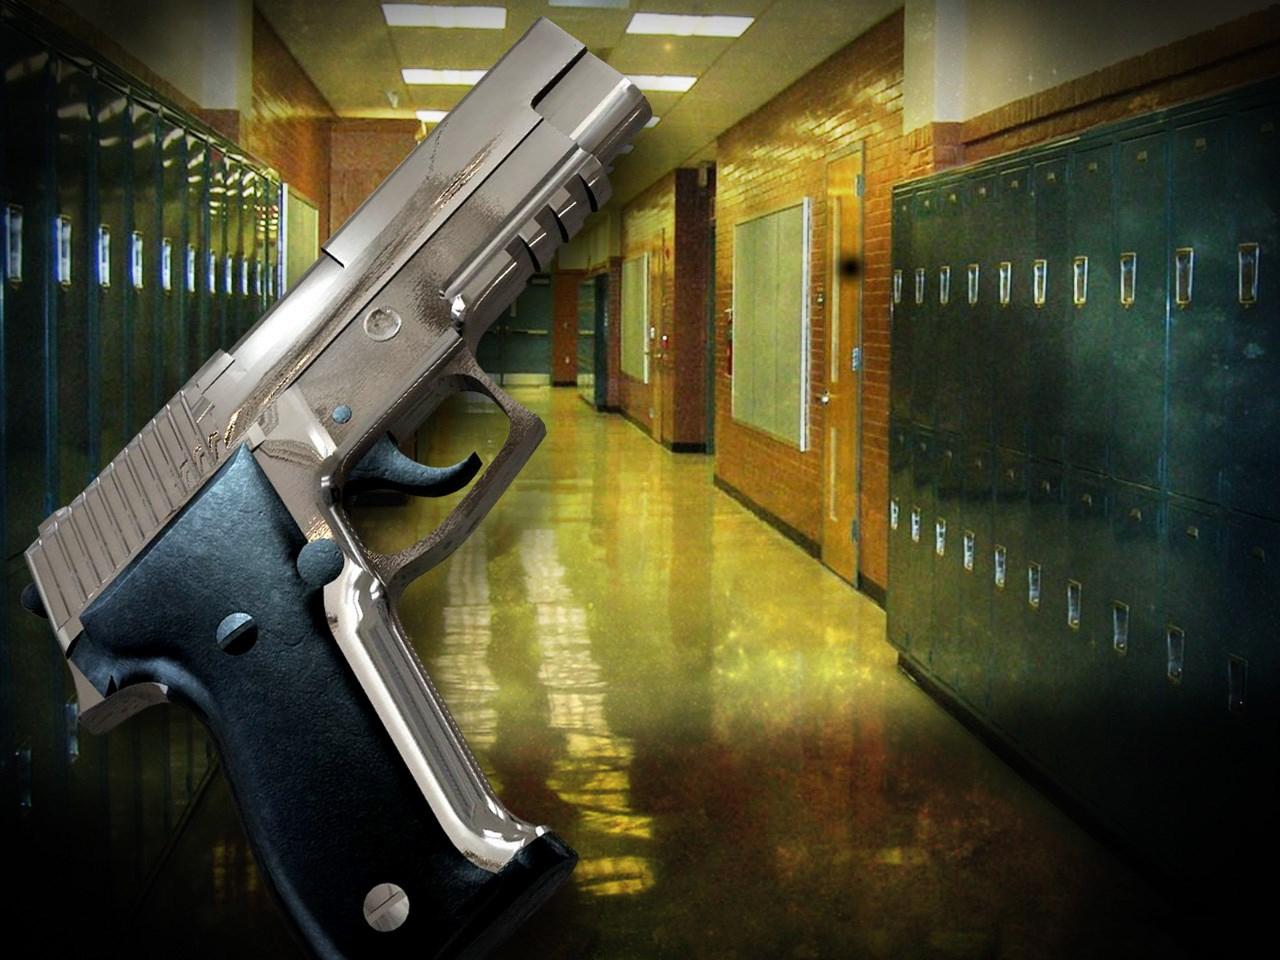 gun in school_1537225522742.jpg.jpg